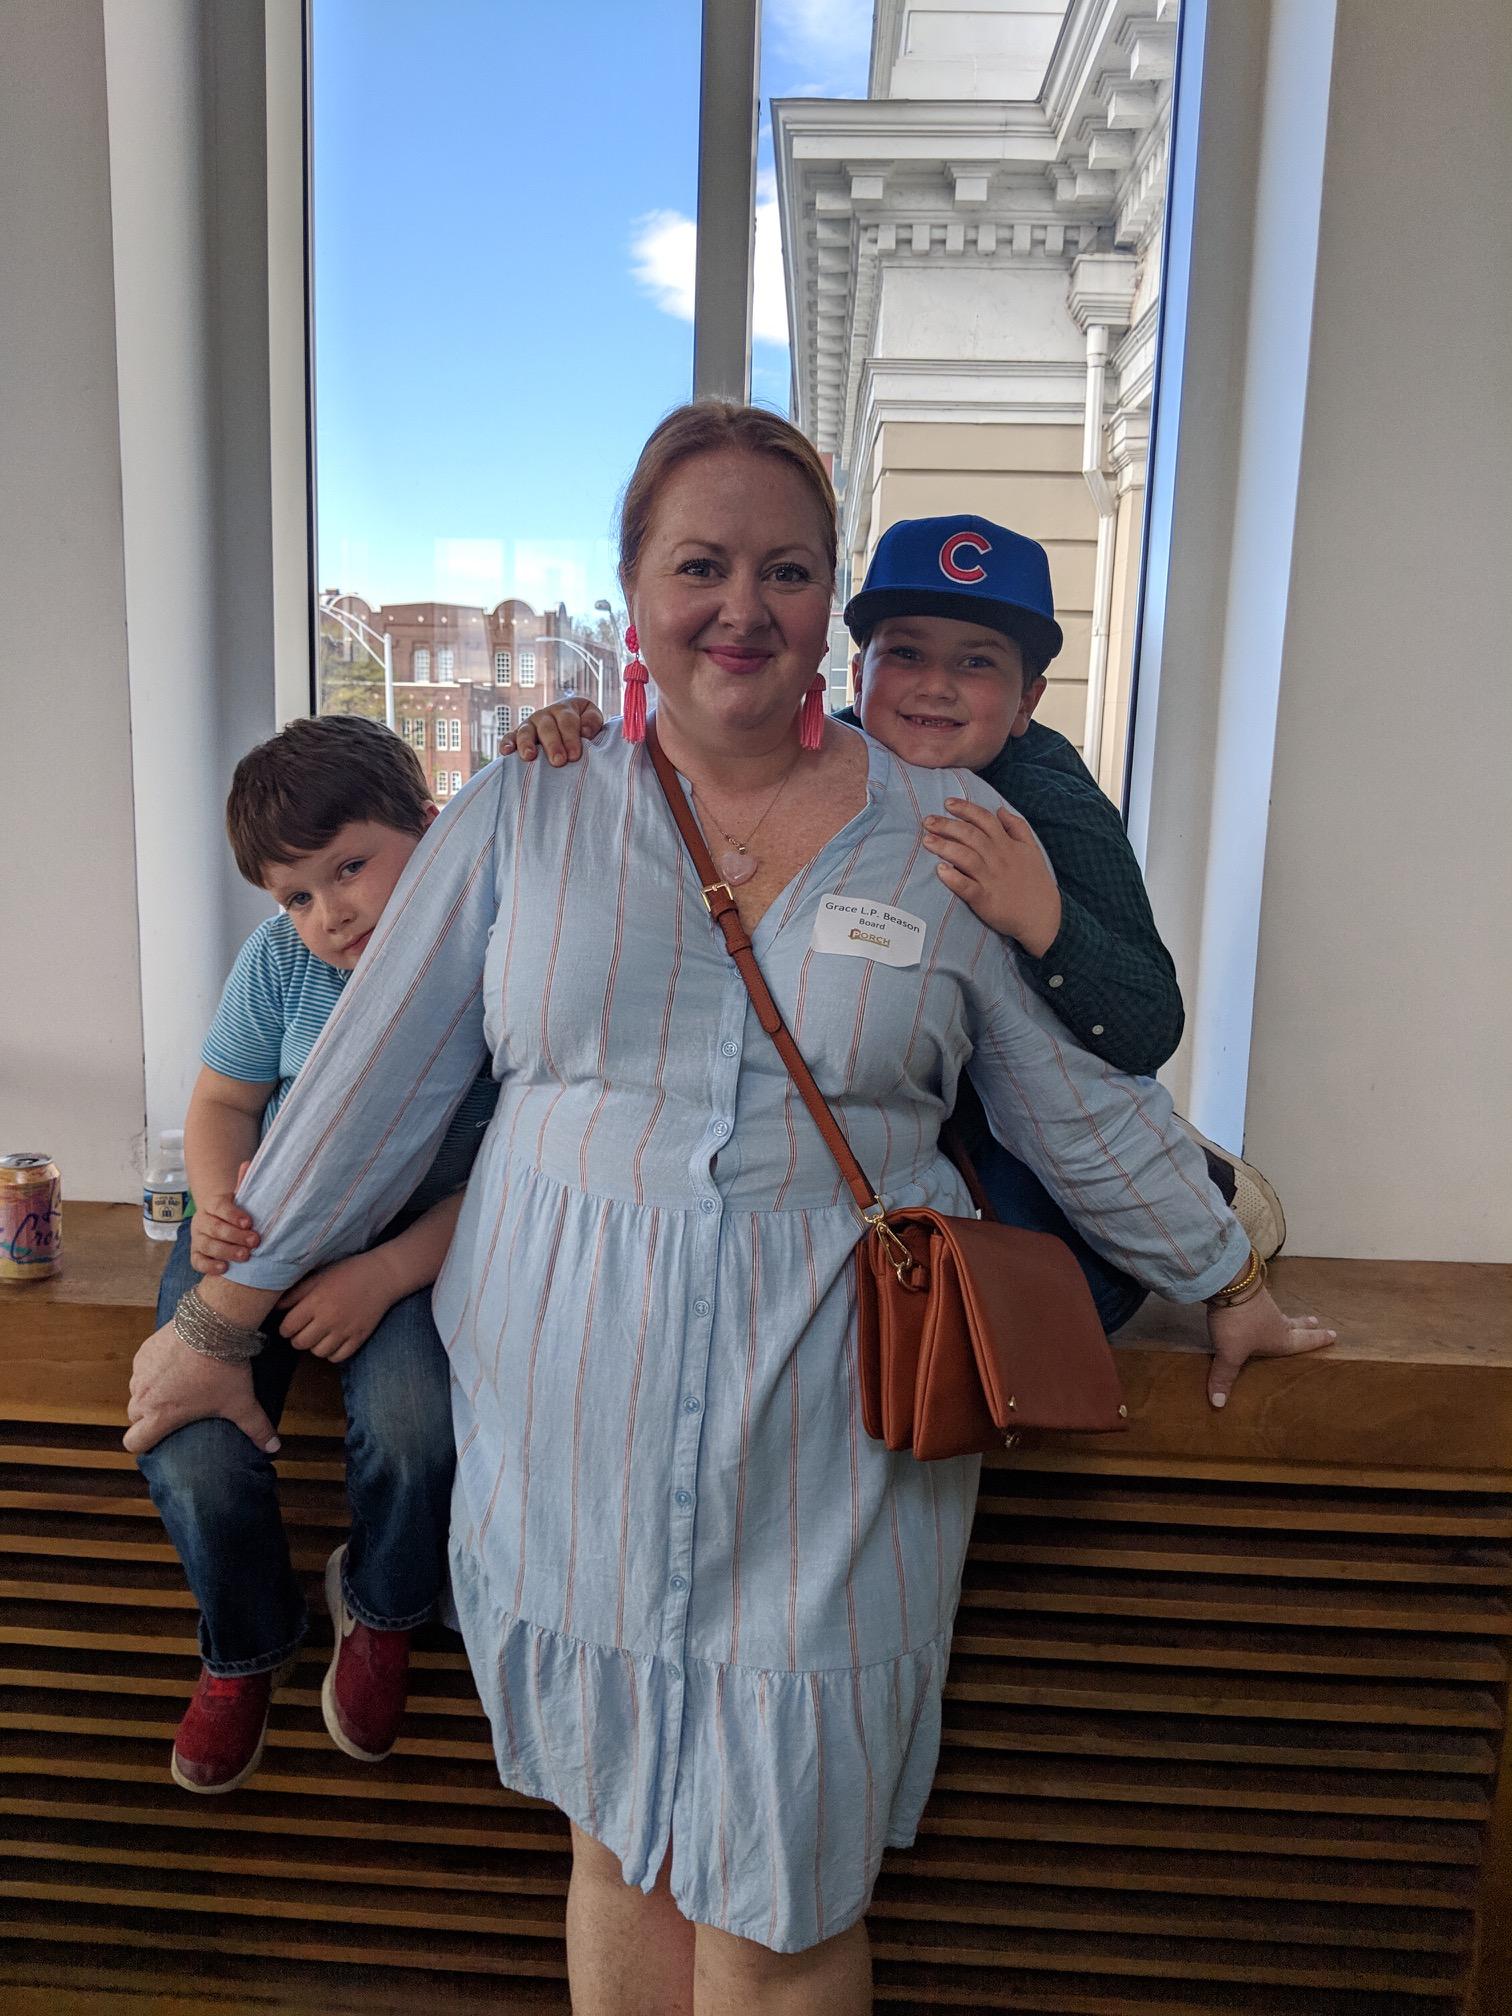 Grace Beason and Her Boys